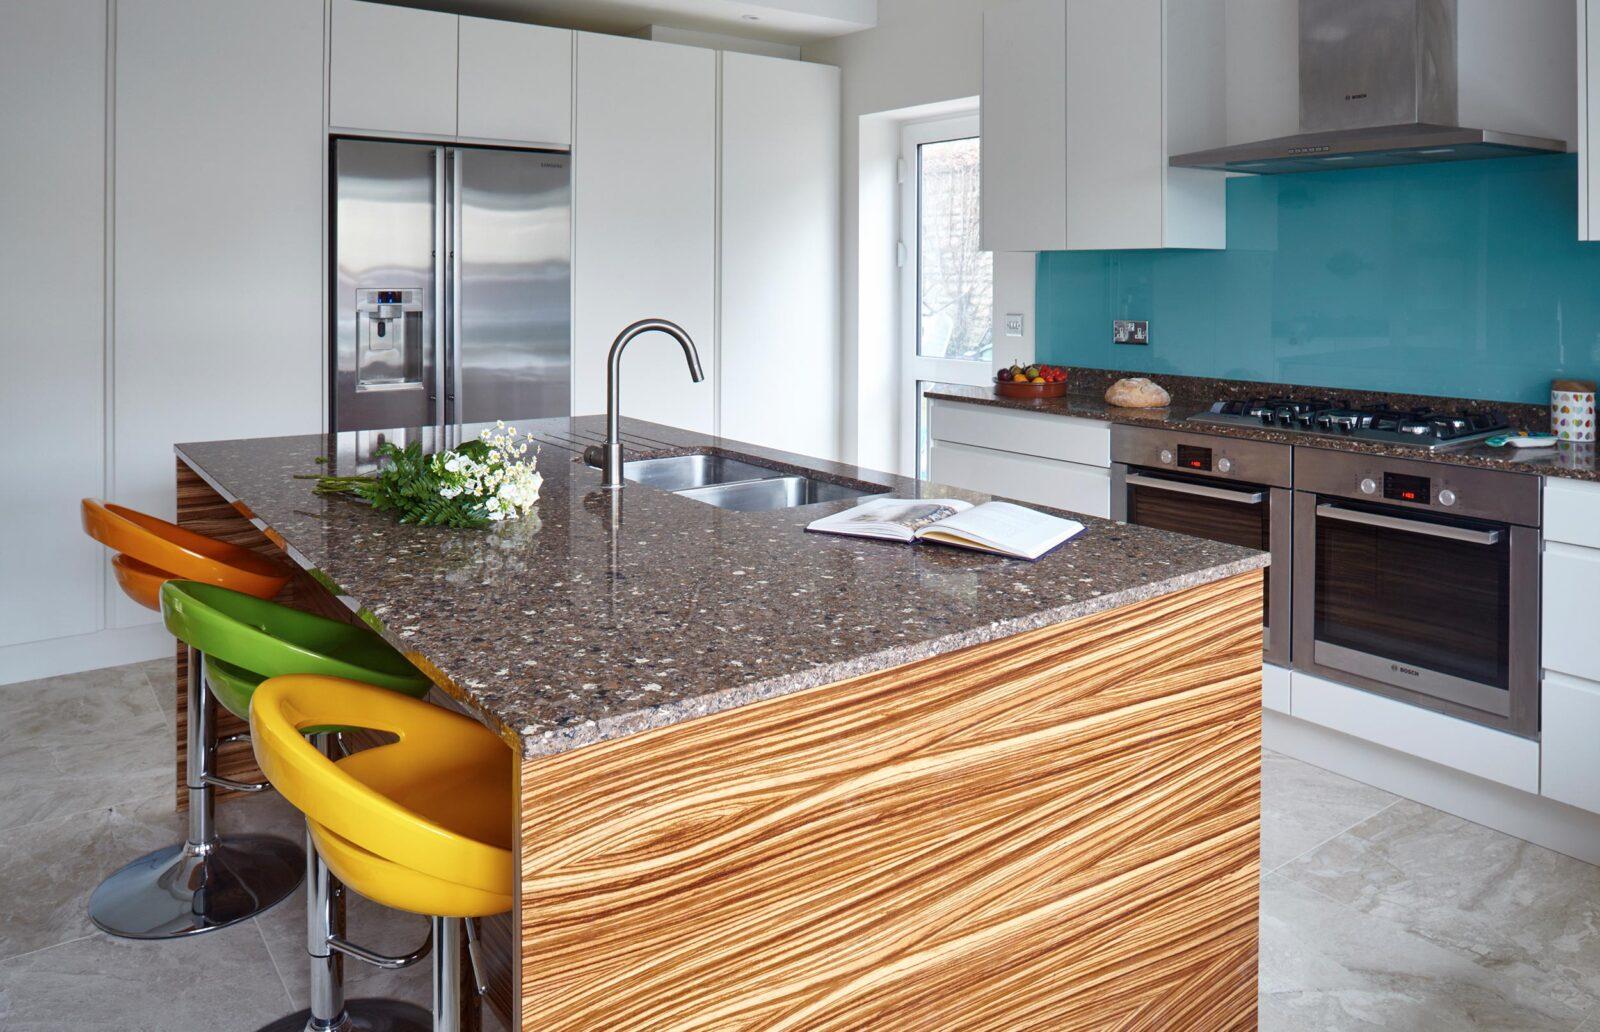 Conversion Bespoke Kitchen - Modern Style with Grey Flooring